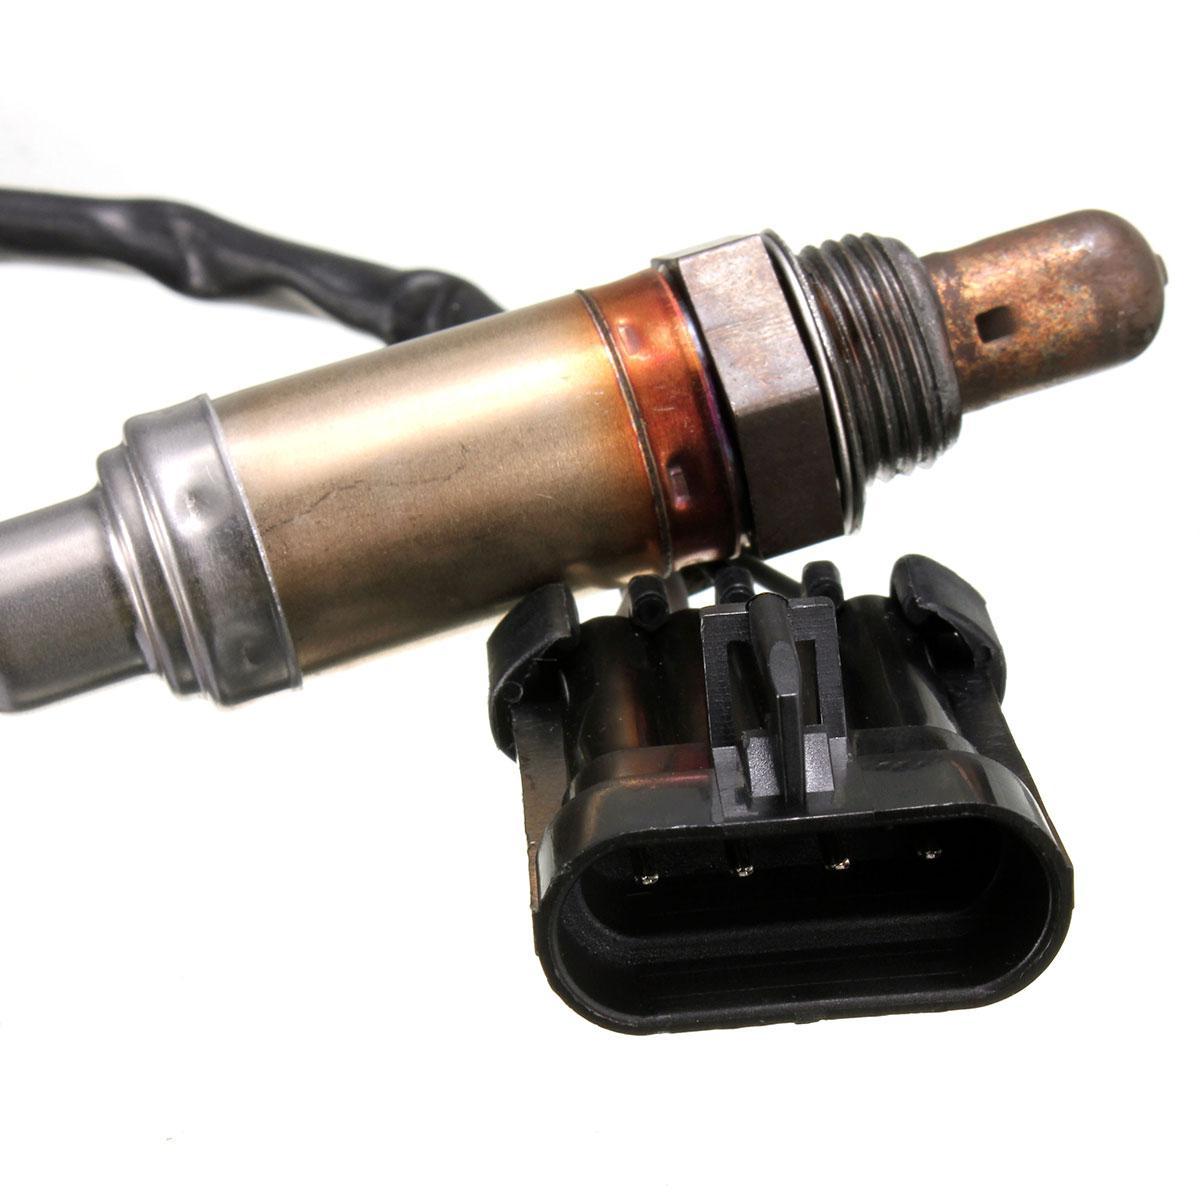 Caprice 25326439 Genuine Holden New Oxygen Sensor LS1 Gen 3 V8 WH Statesman